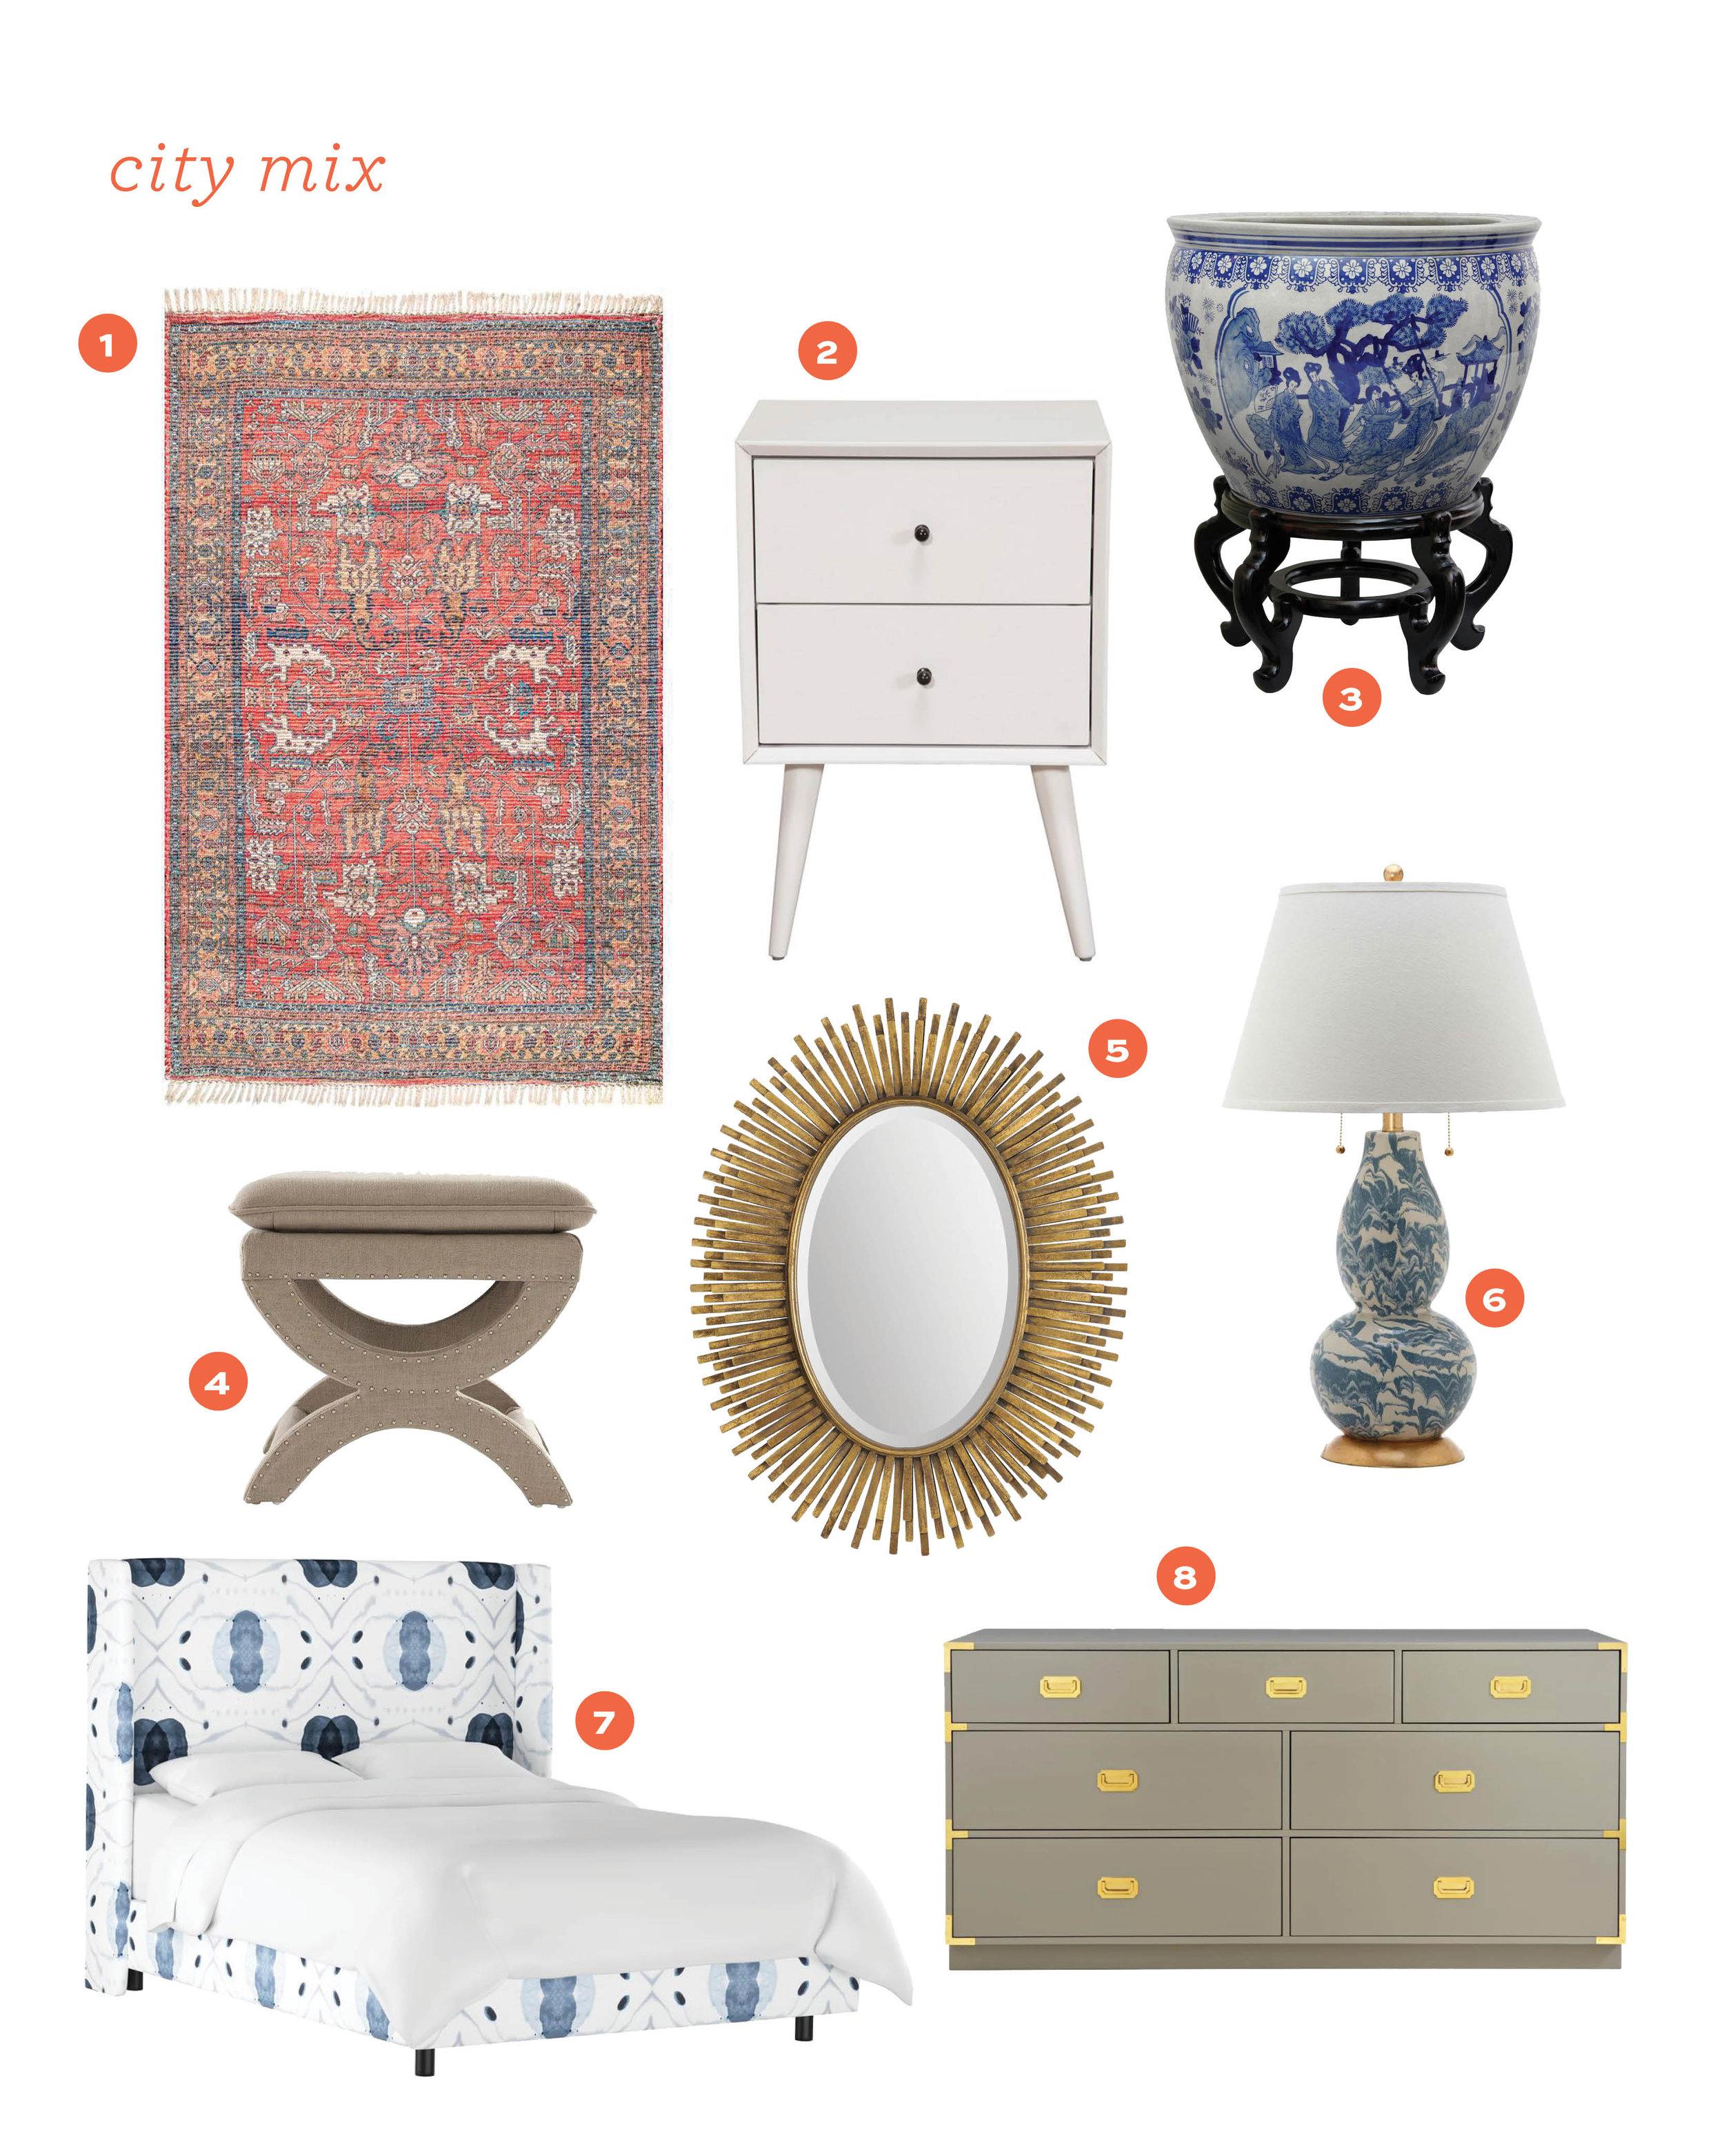 1.  flatweave rug  2.  mid century nightstand  3.  blue and white planter  4.  upholstered stool  5.  fringe frame mirror  6.  marbleized lamp  7.  wingback bed  8 . dresser